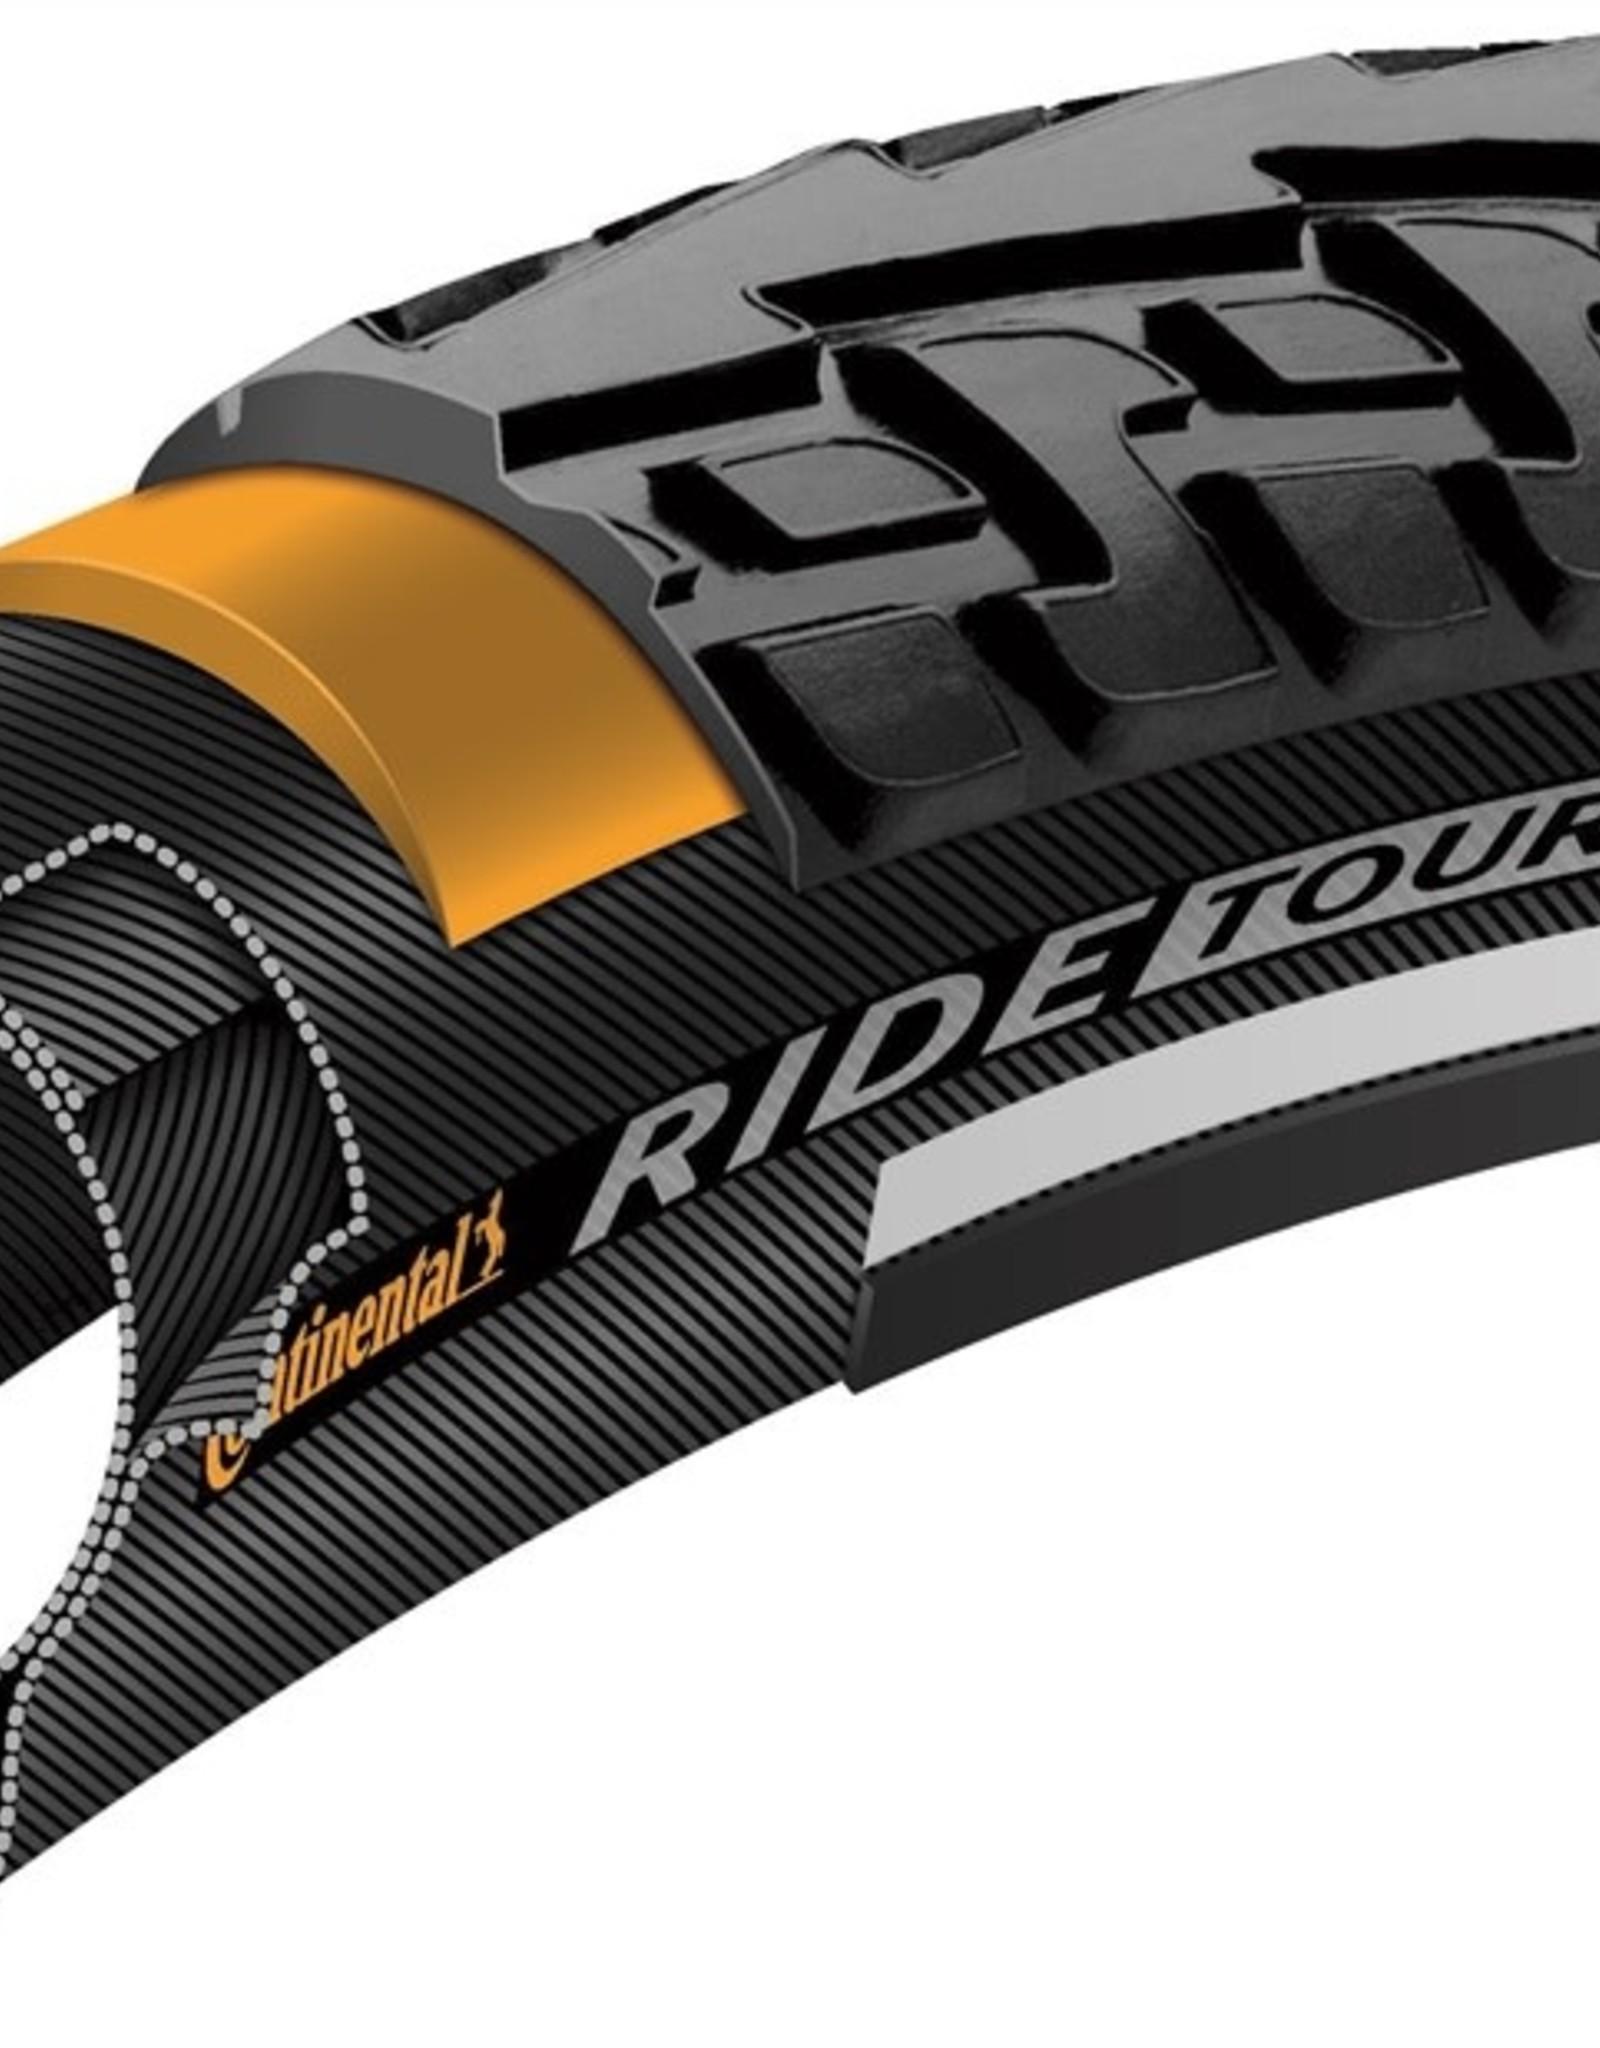 CONTINENTAL CONTINENTAL Tire RIDE TOUR 700 x 32c